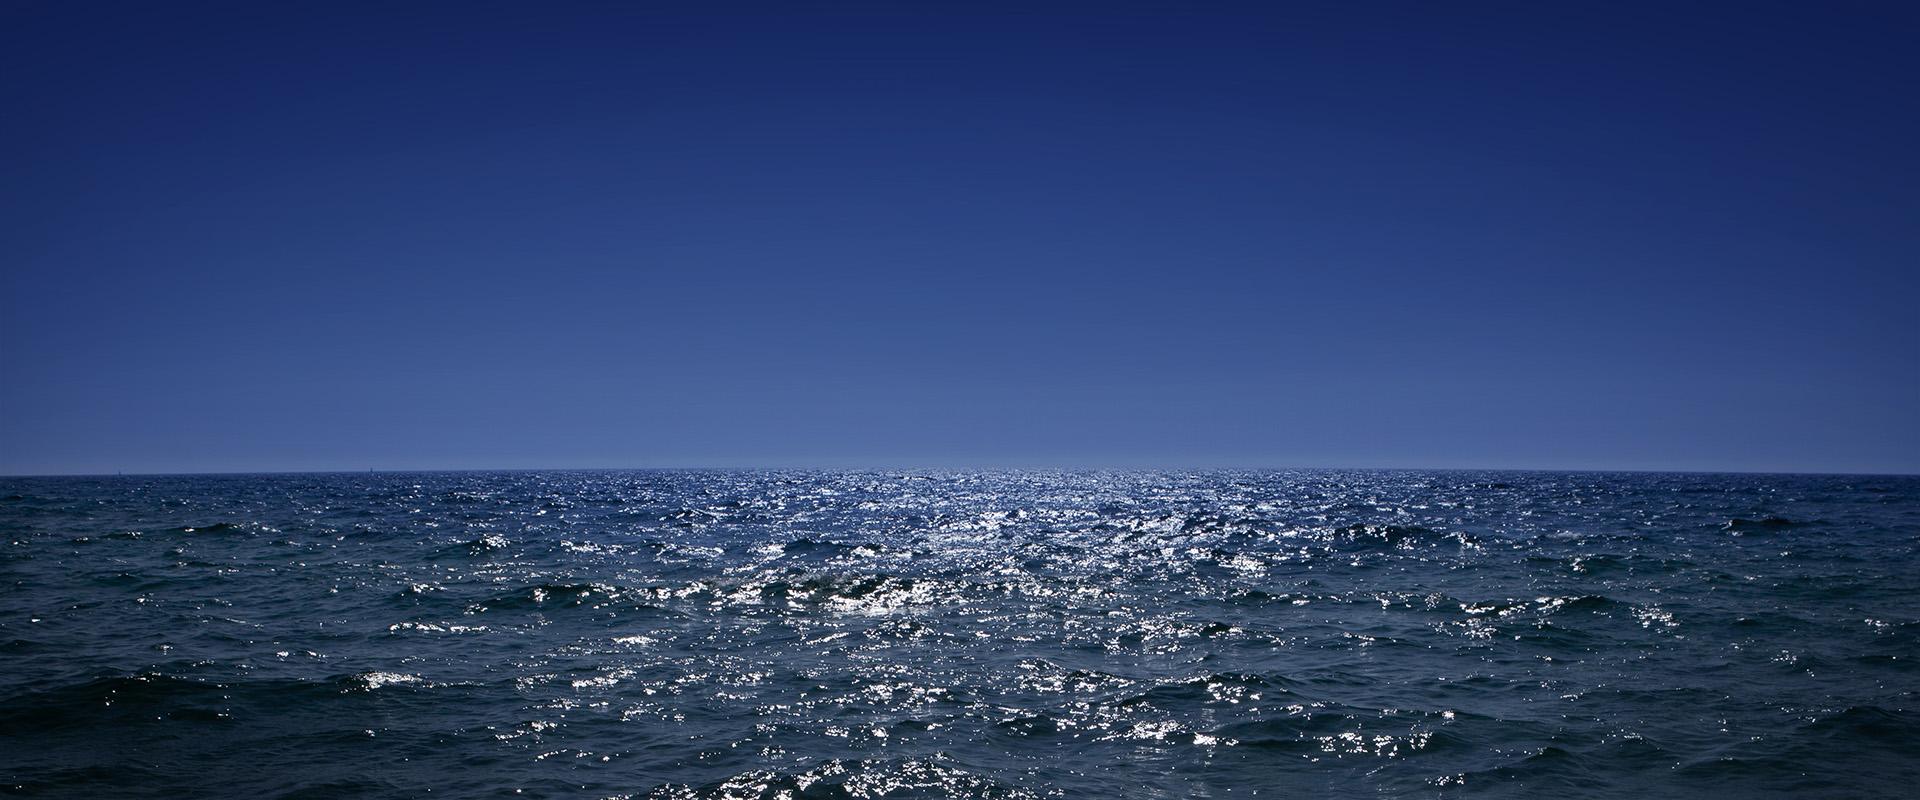 blue ocean strategies seek out new opportunities